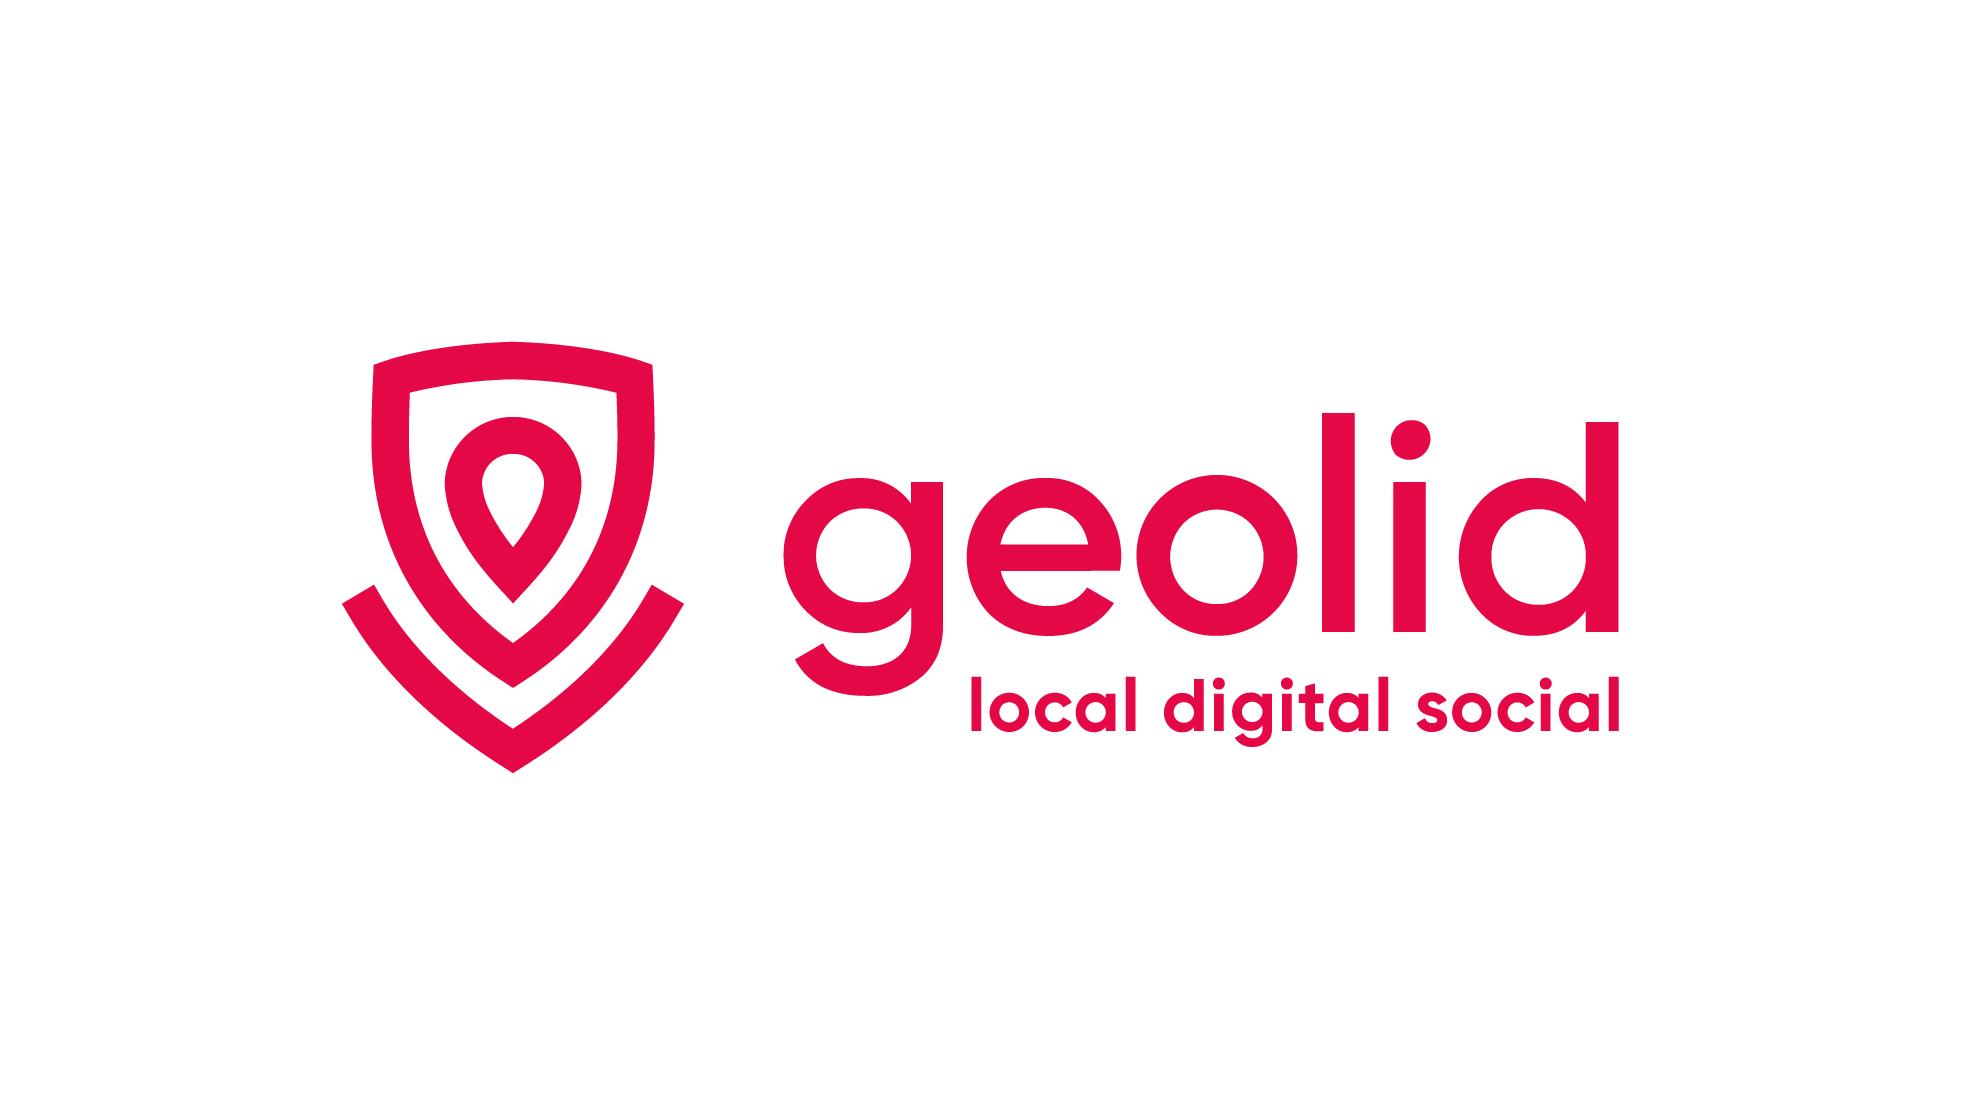 Avis Geolid : Editeur de logiciel SaaS et spécialiste du média local - appvizer